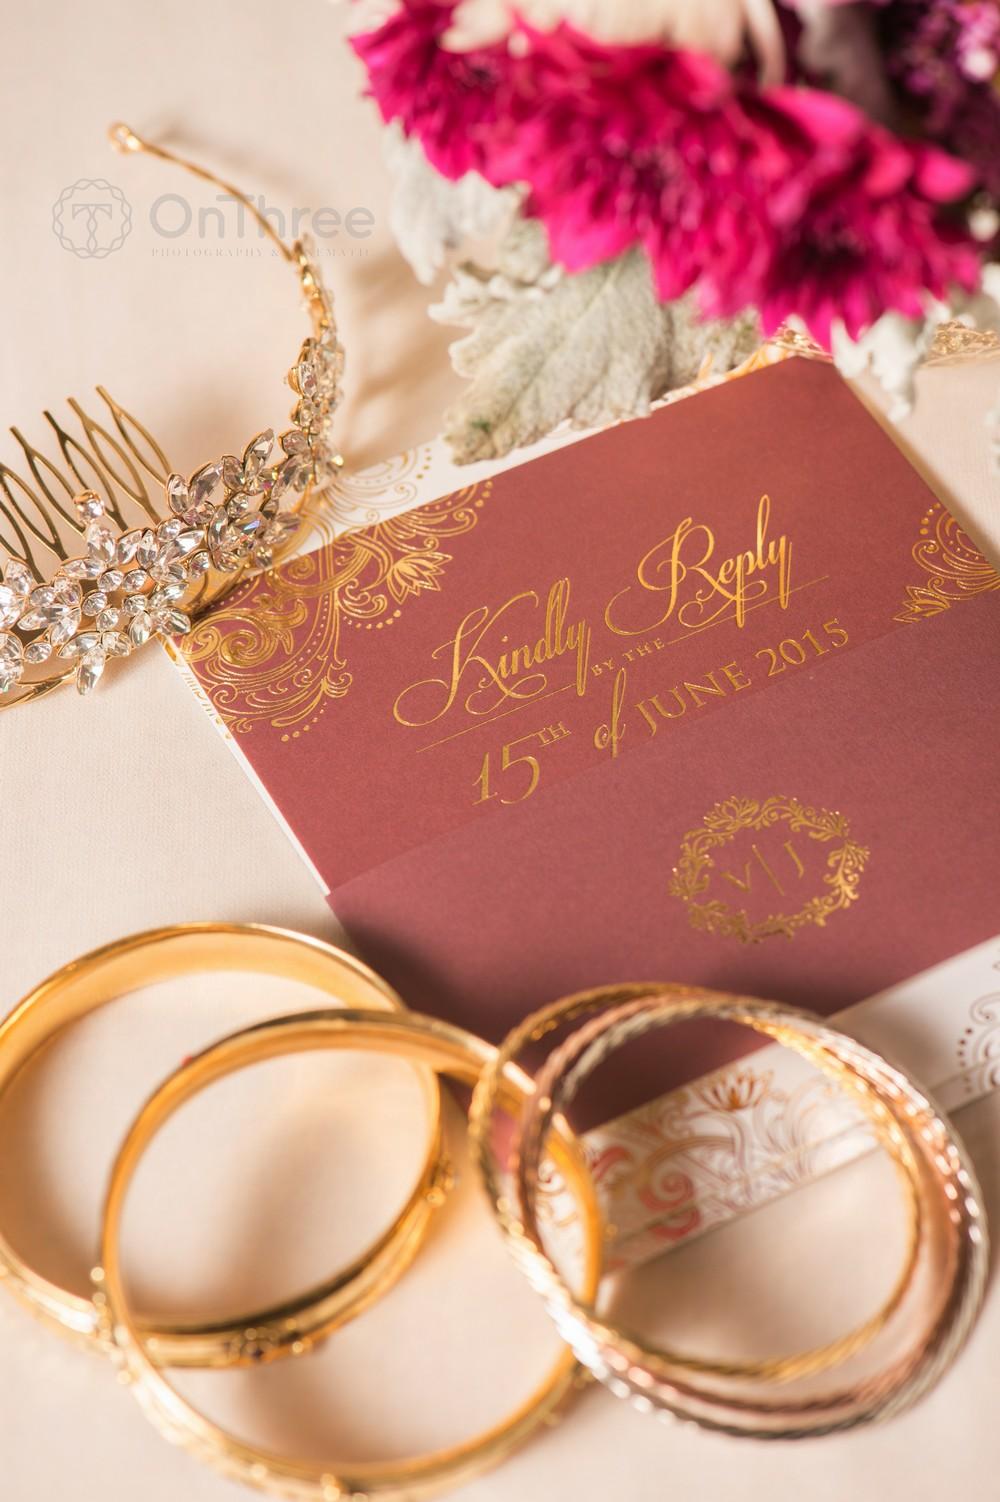 vanessa-williams-wedding-enclosure-cards-adorn-invitations.jpg